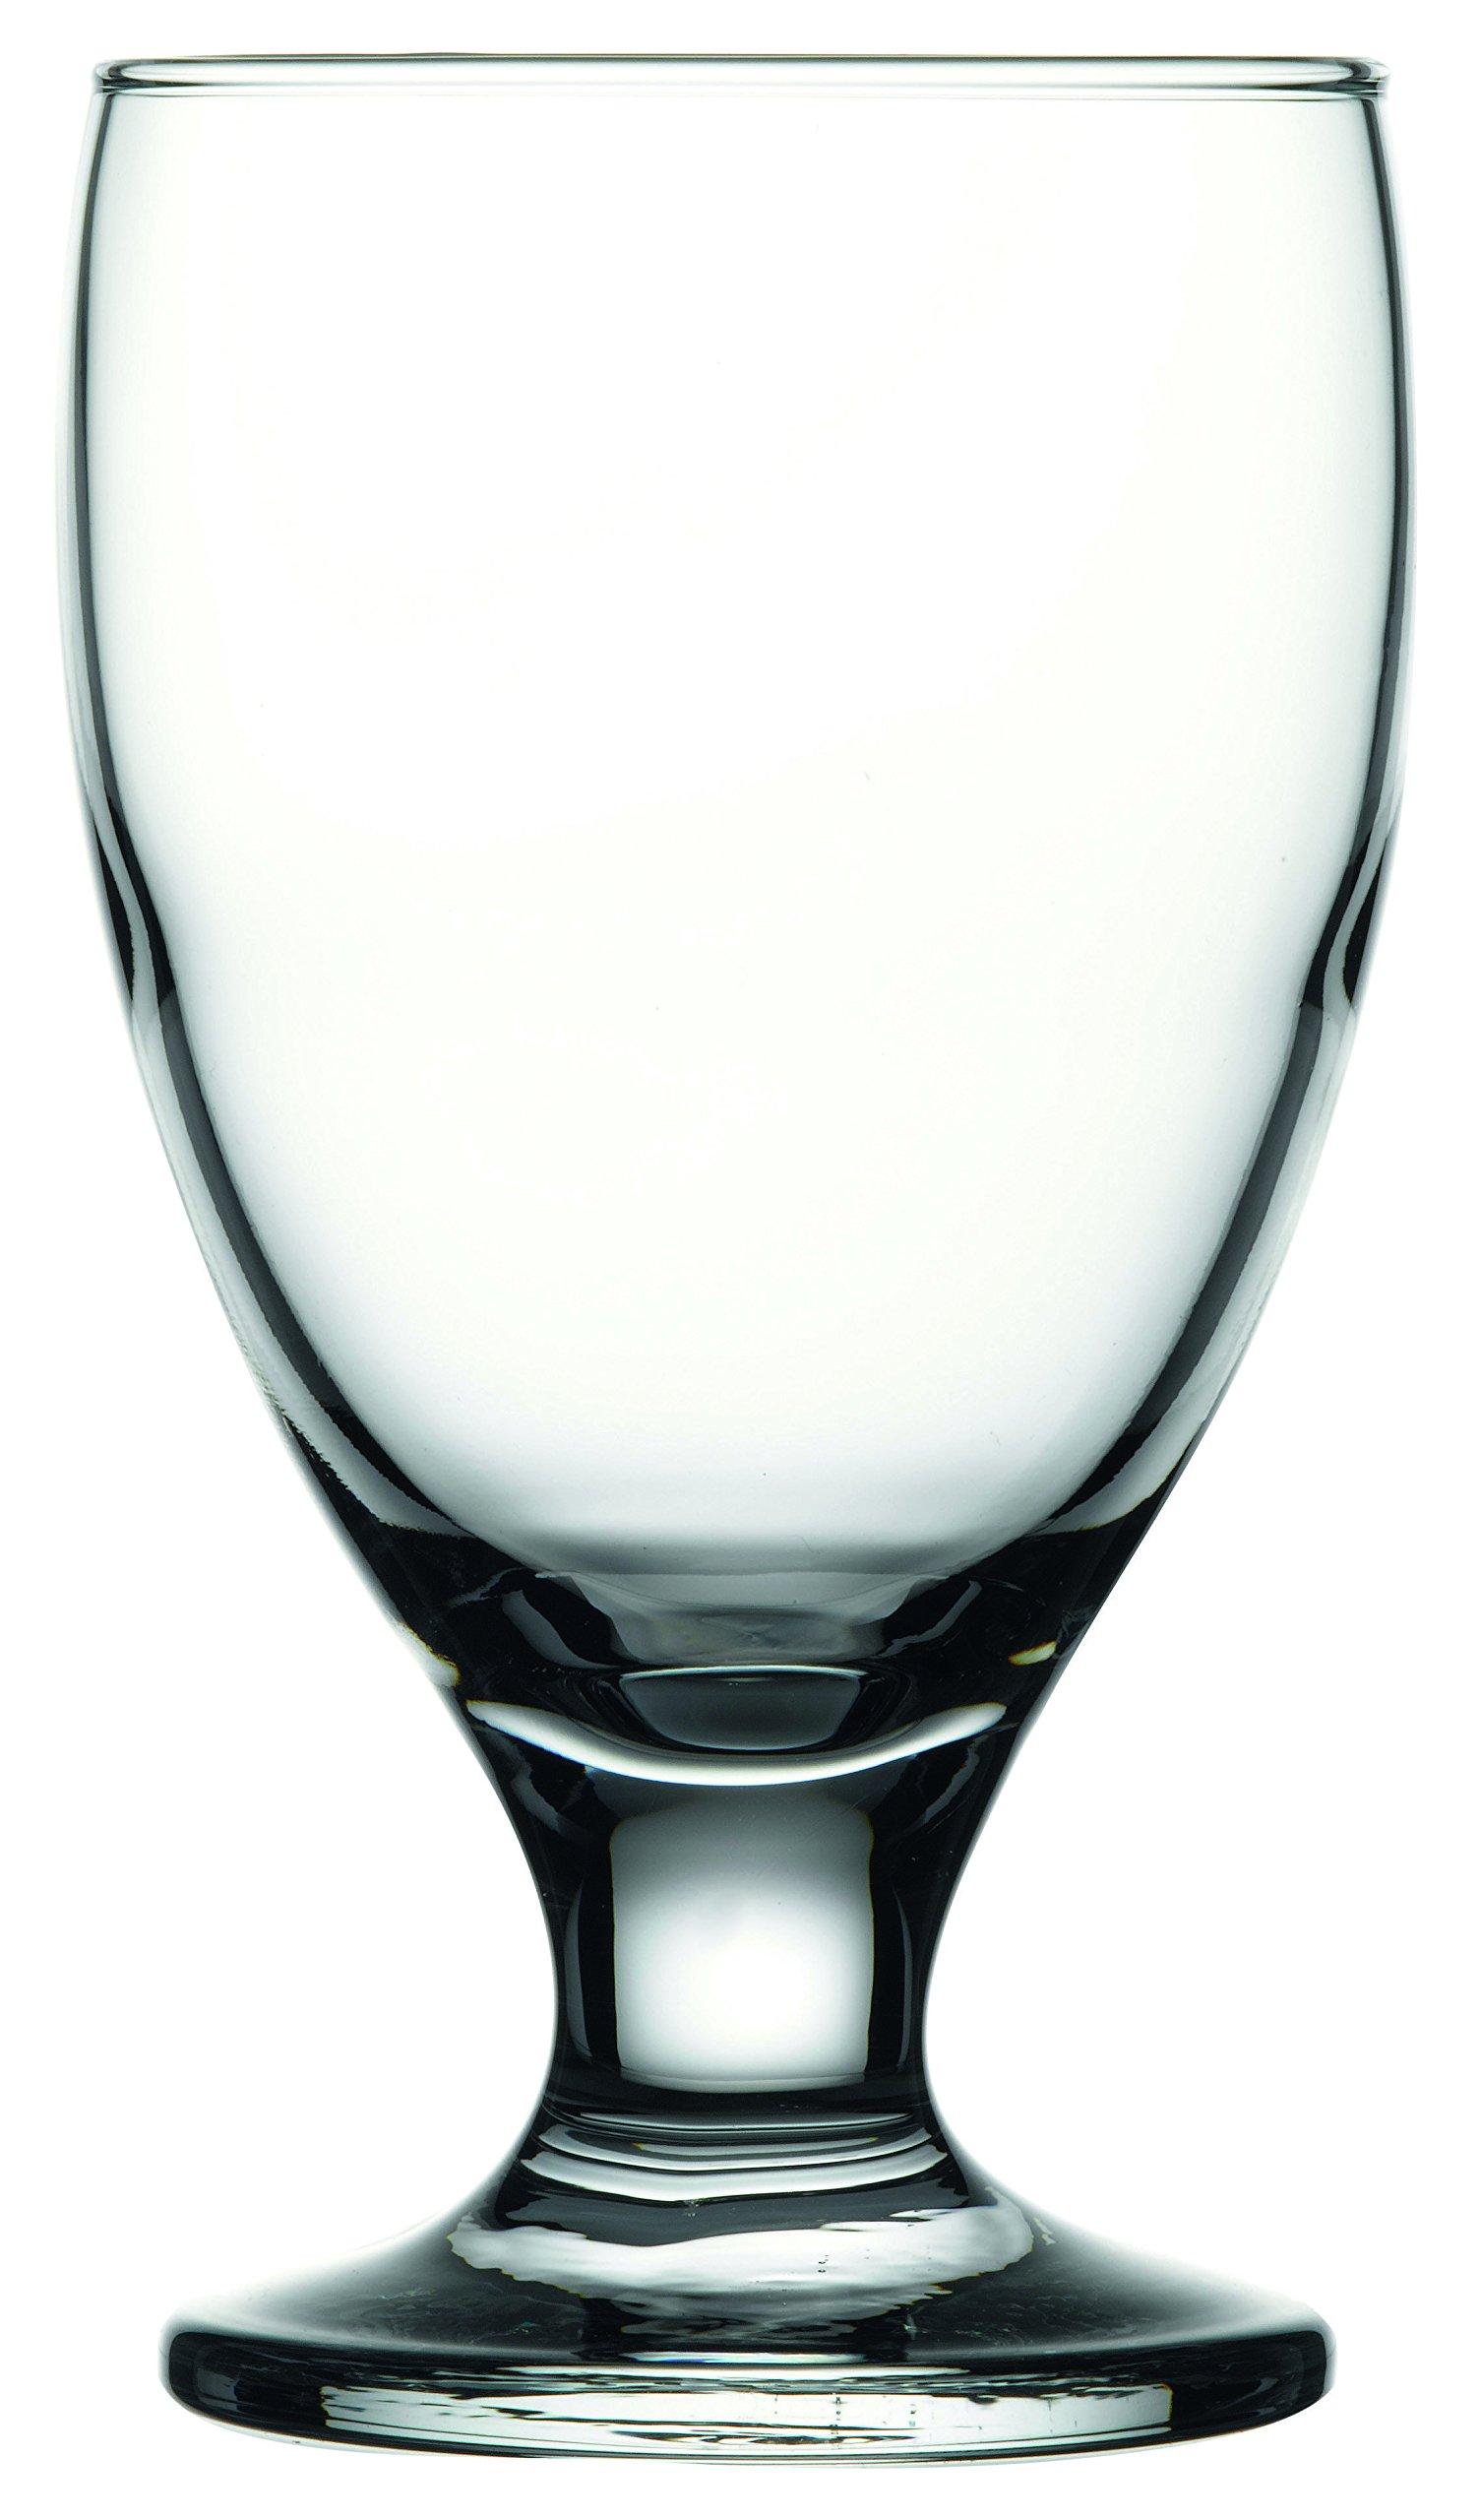 Stanton 10.5 Oz. Banquet Goblet Glass (Set of 12 Per Case)